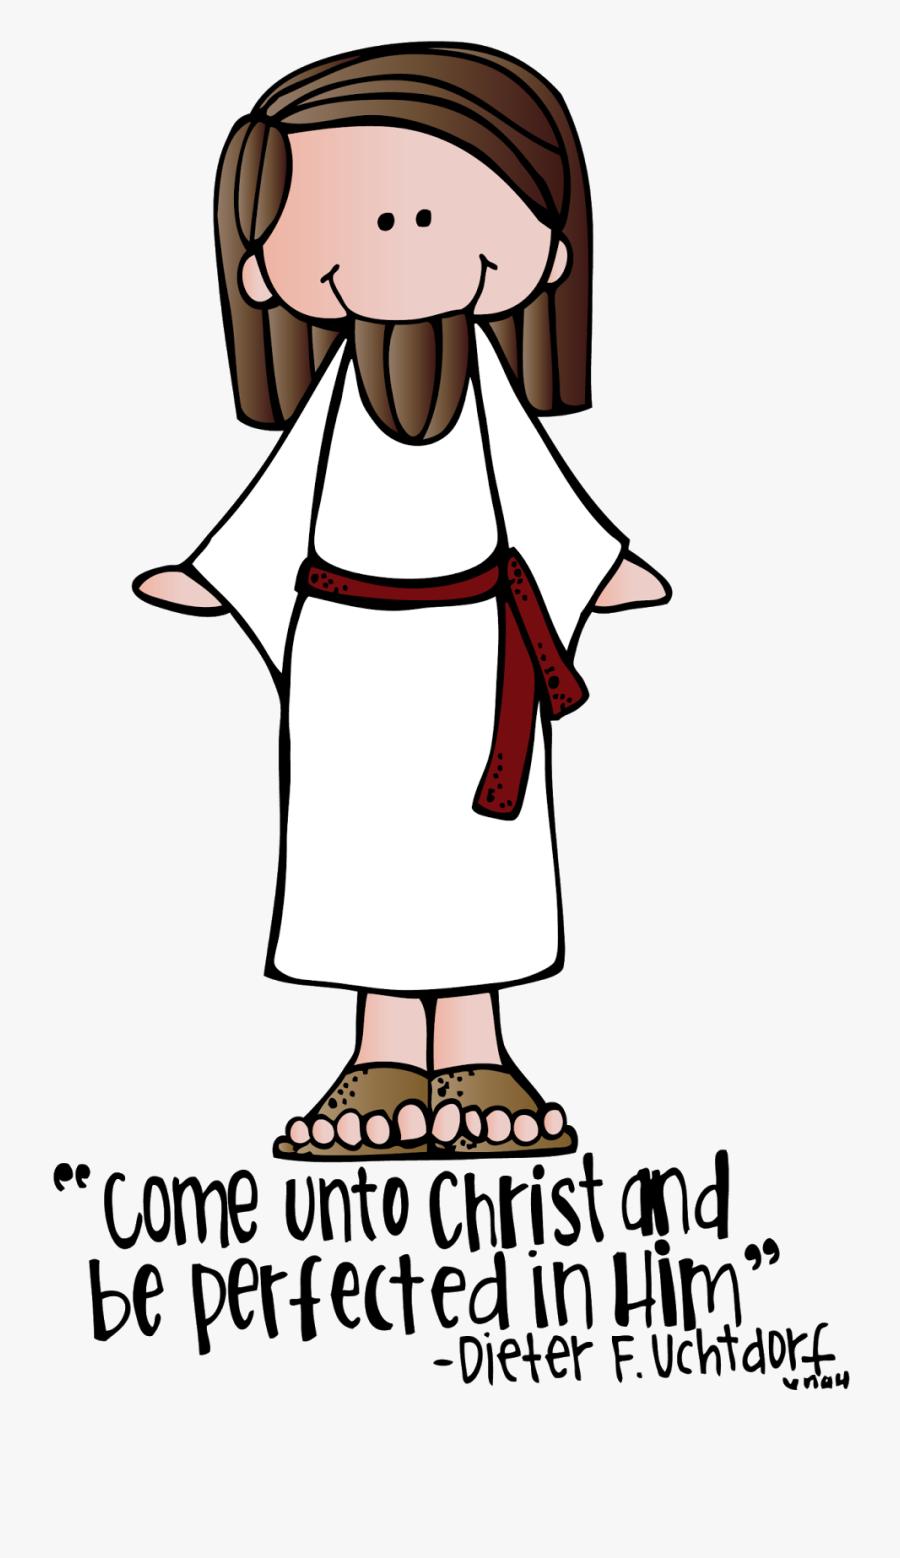 Transparent 10 Commandments Clipart - Melonheadz Jesus, Transparent Clipart